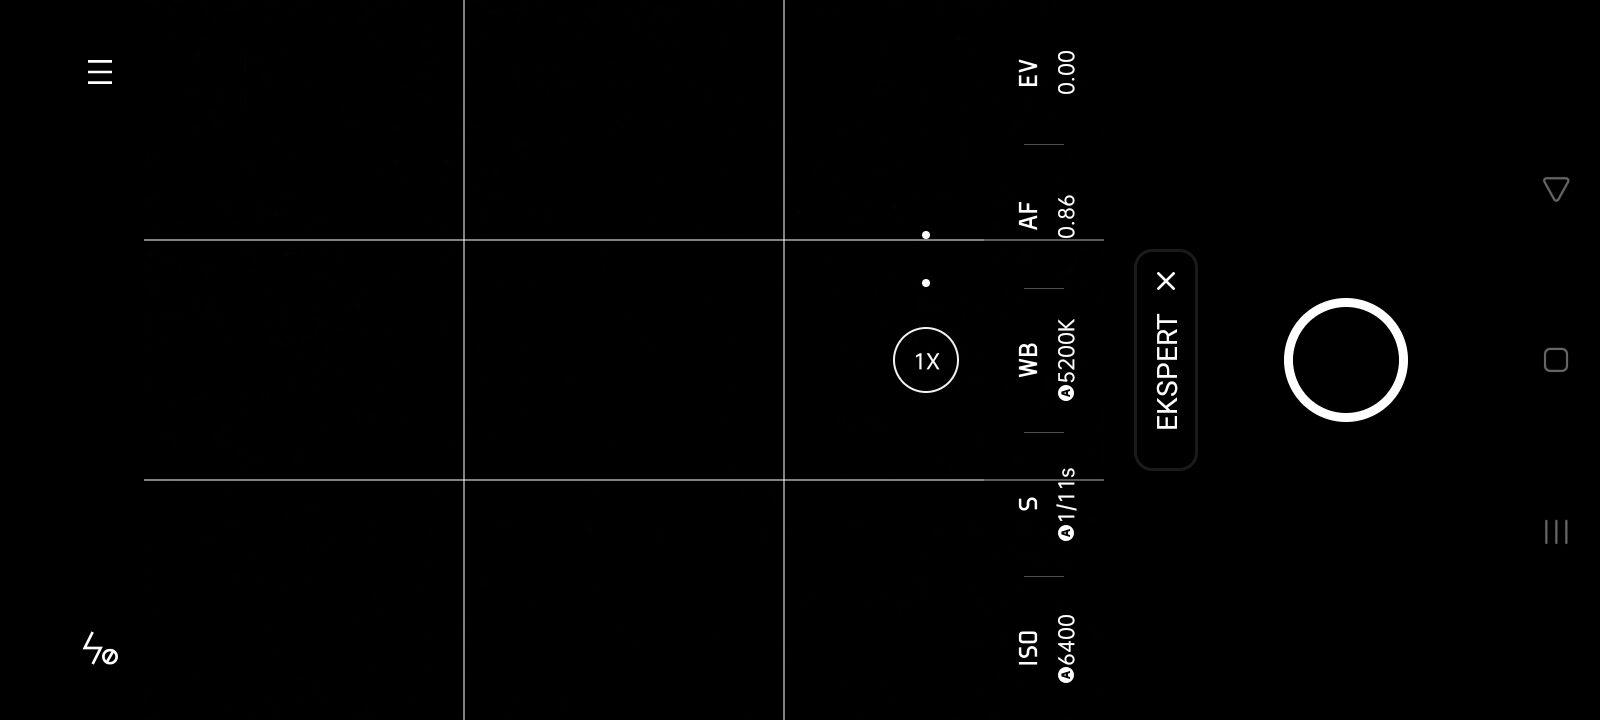 Tryb manualny Oppo A53